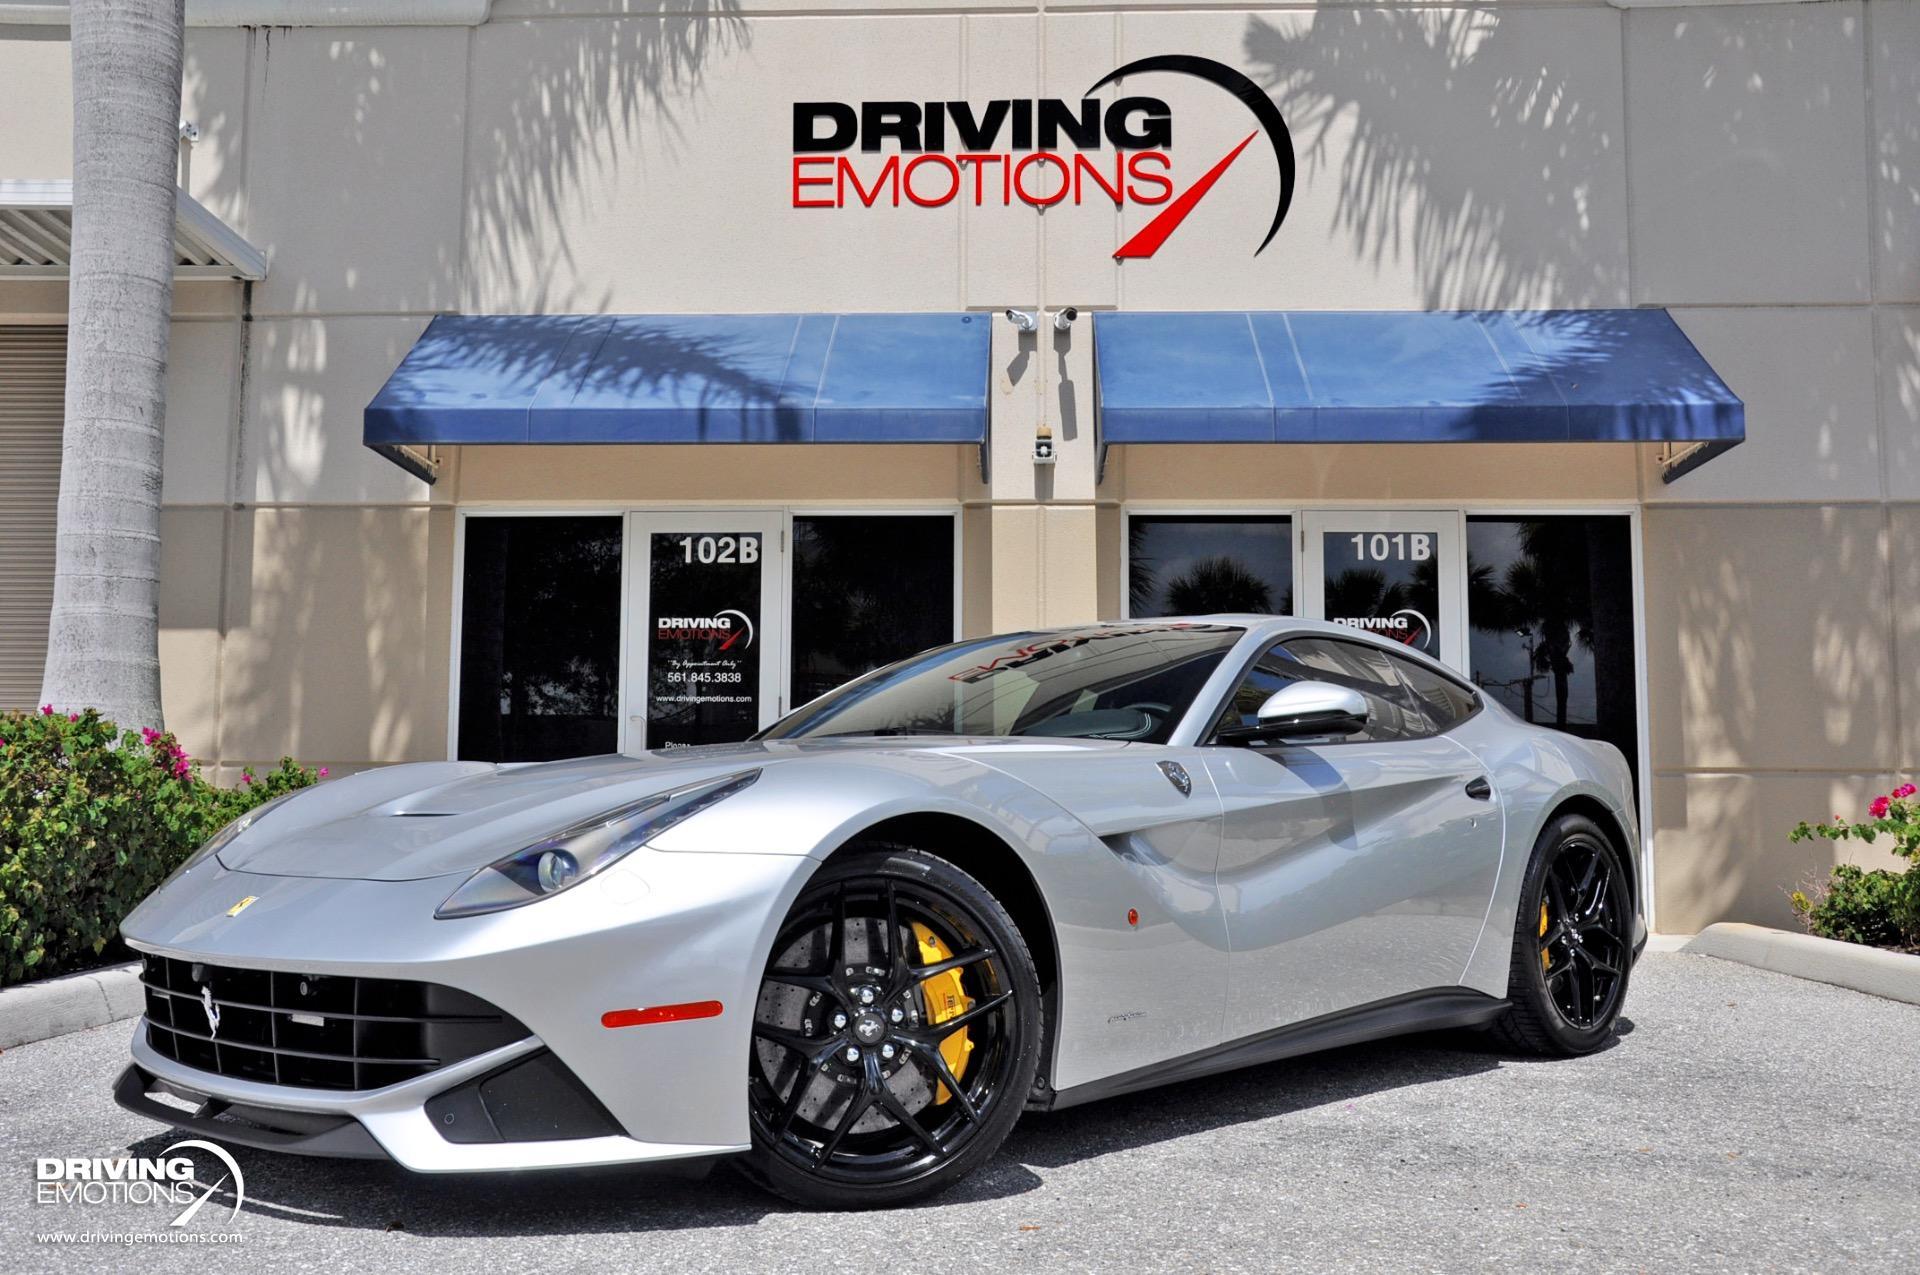 Used 2014 Ferrari F12 Berlinetta V12 FRONT LIFT!! | Lake Park, FL